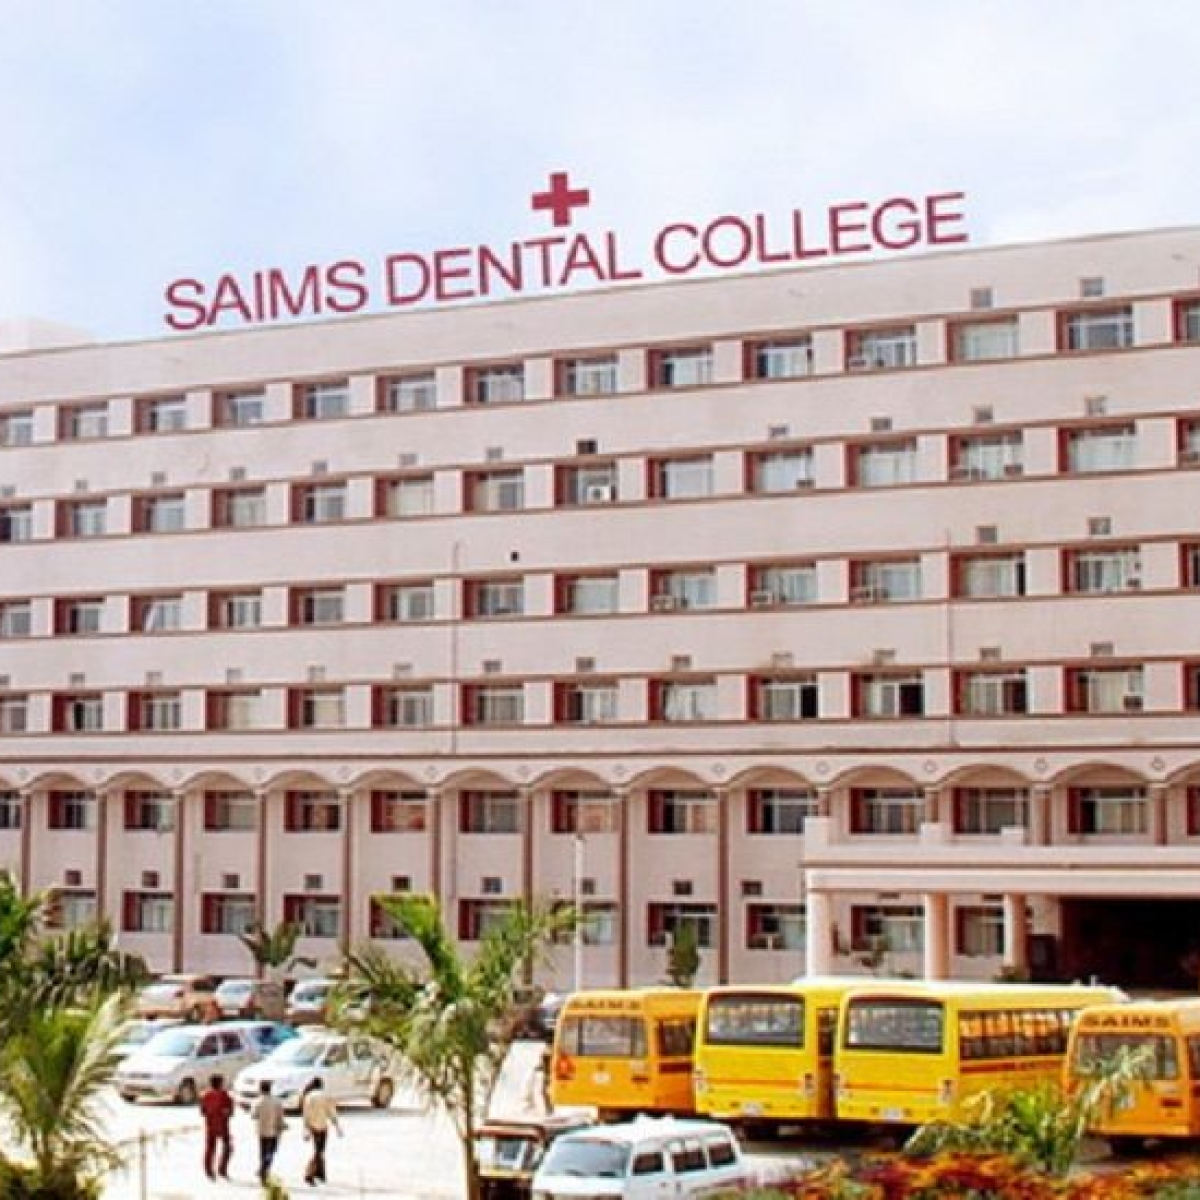 Indore: Sri Aurobindo Institute of Medical Sciences claims successful use of Remdesivir, Favipiravir